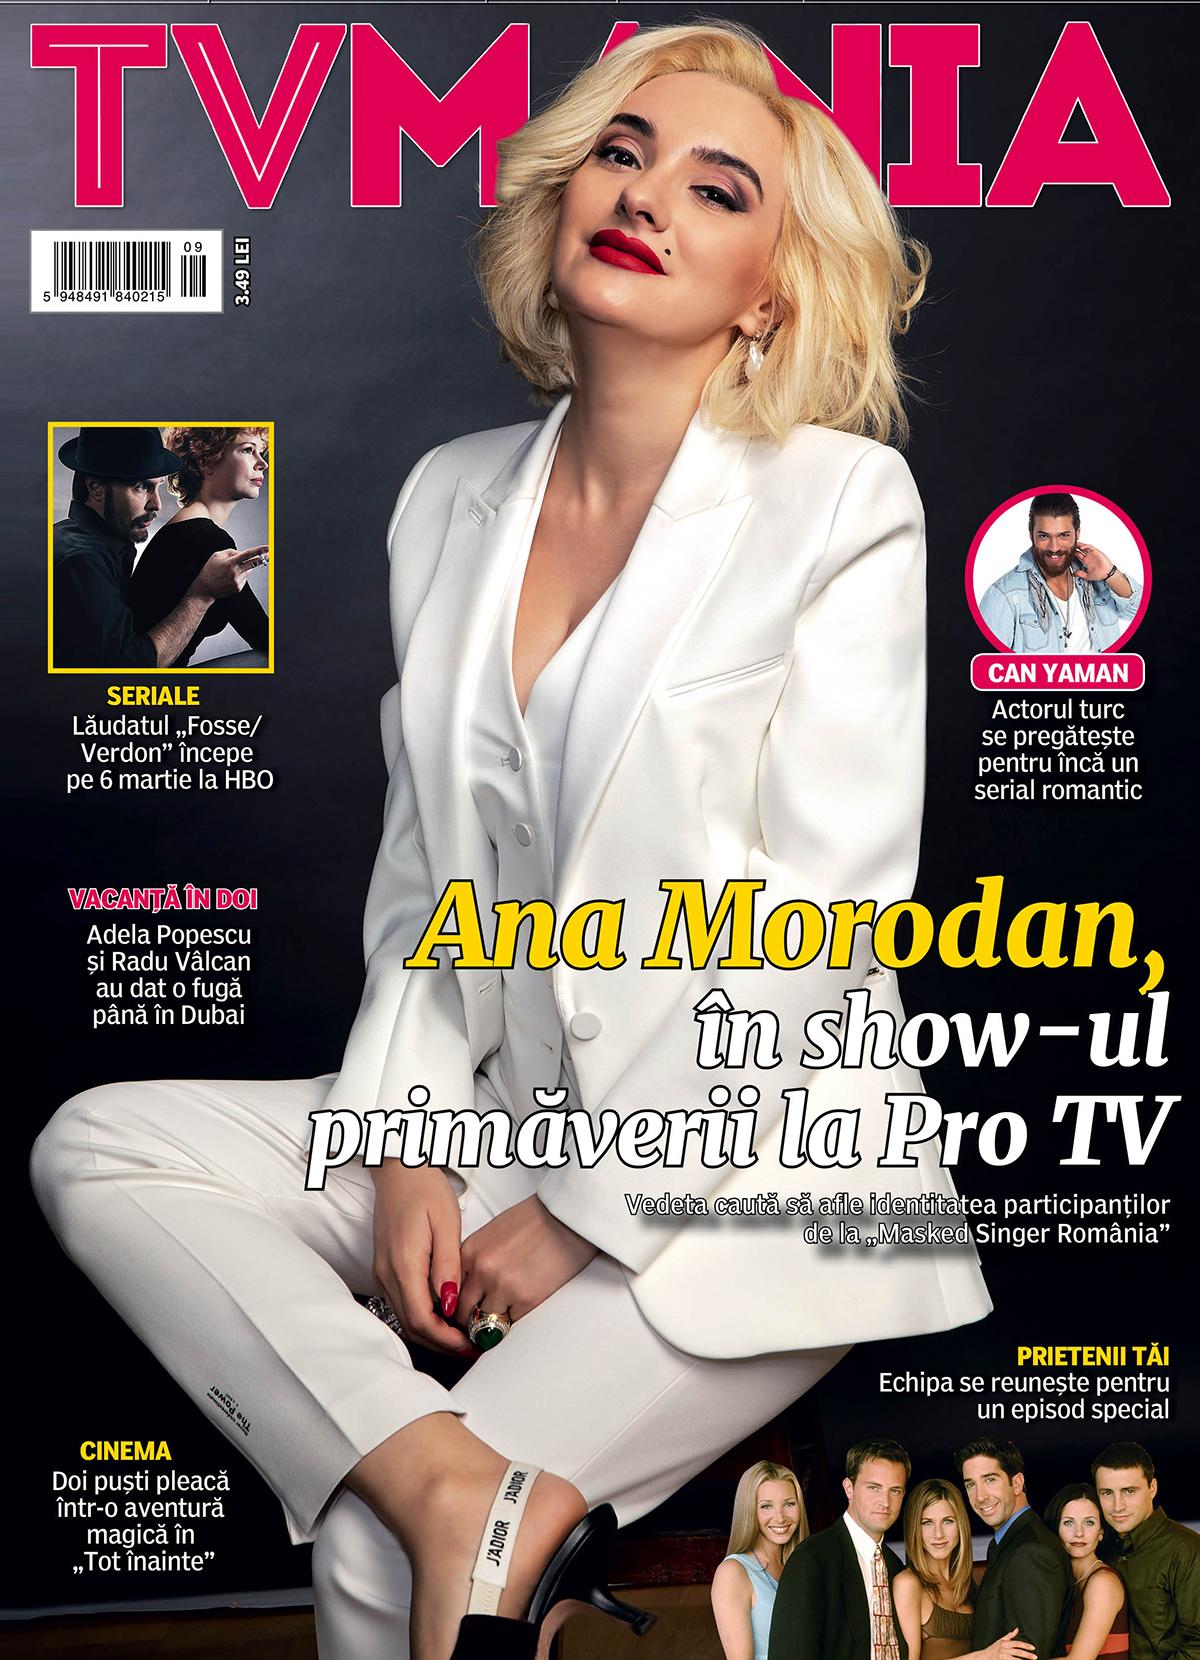 MASKED SINGER ROMANIA , TV MANIA, ANA MORODAN